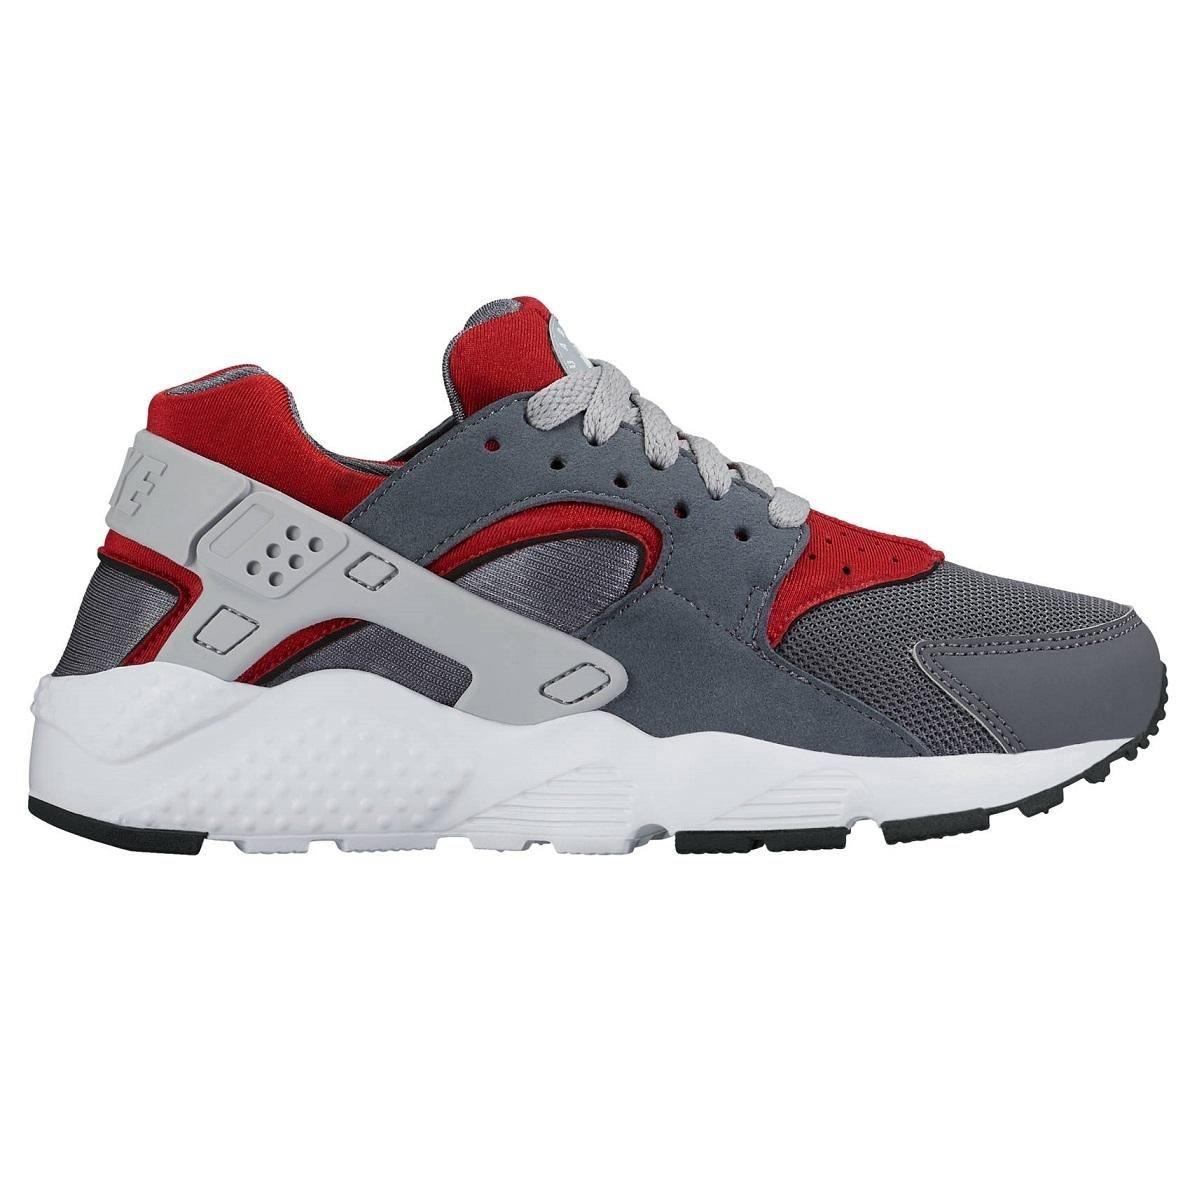 5b9b2d220d Galleon - Nike Huarache Run - Boys Grade School 654275-018 (6y)